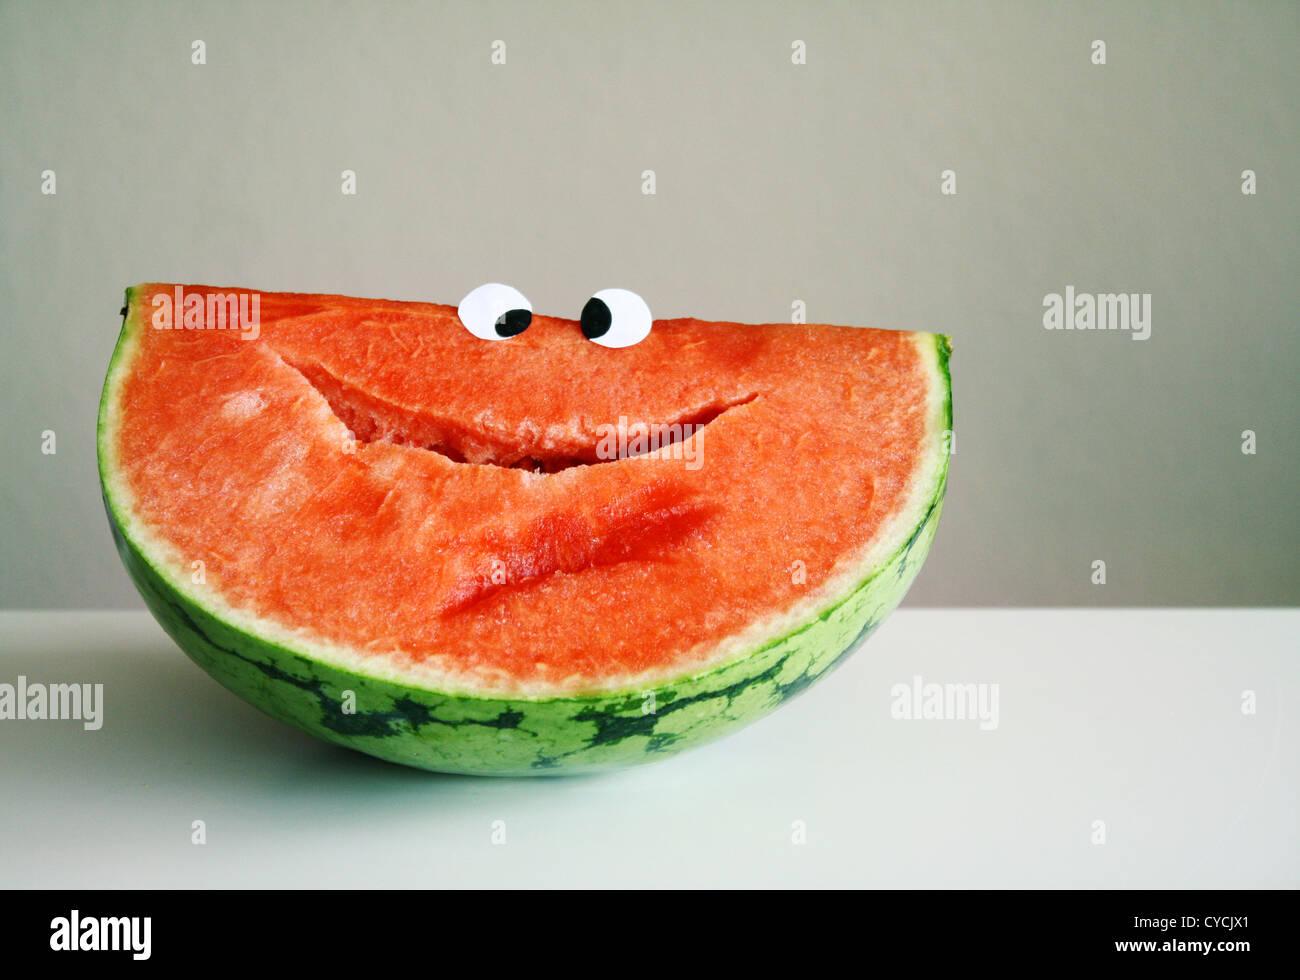 A sorrir,frutas,melancia Imagens de Stock